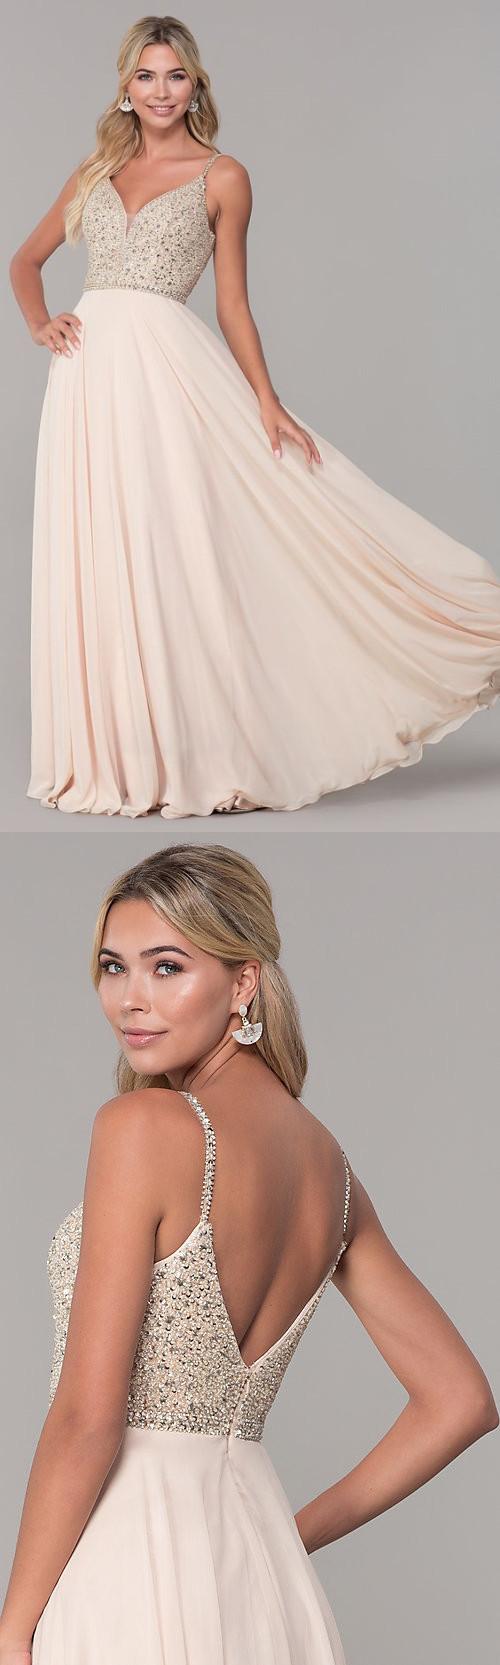 Long V-Neck Sleeveless Beaded-Bodice Prom Dress